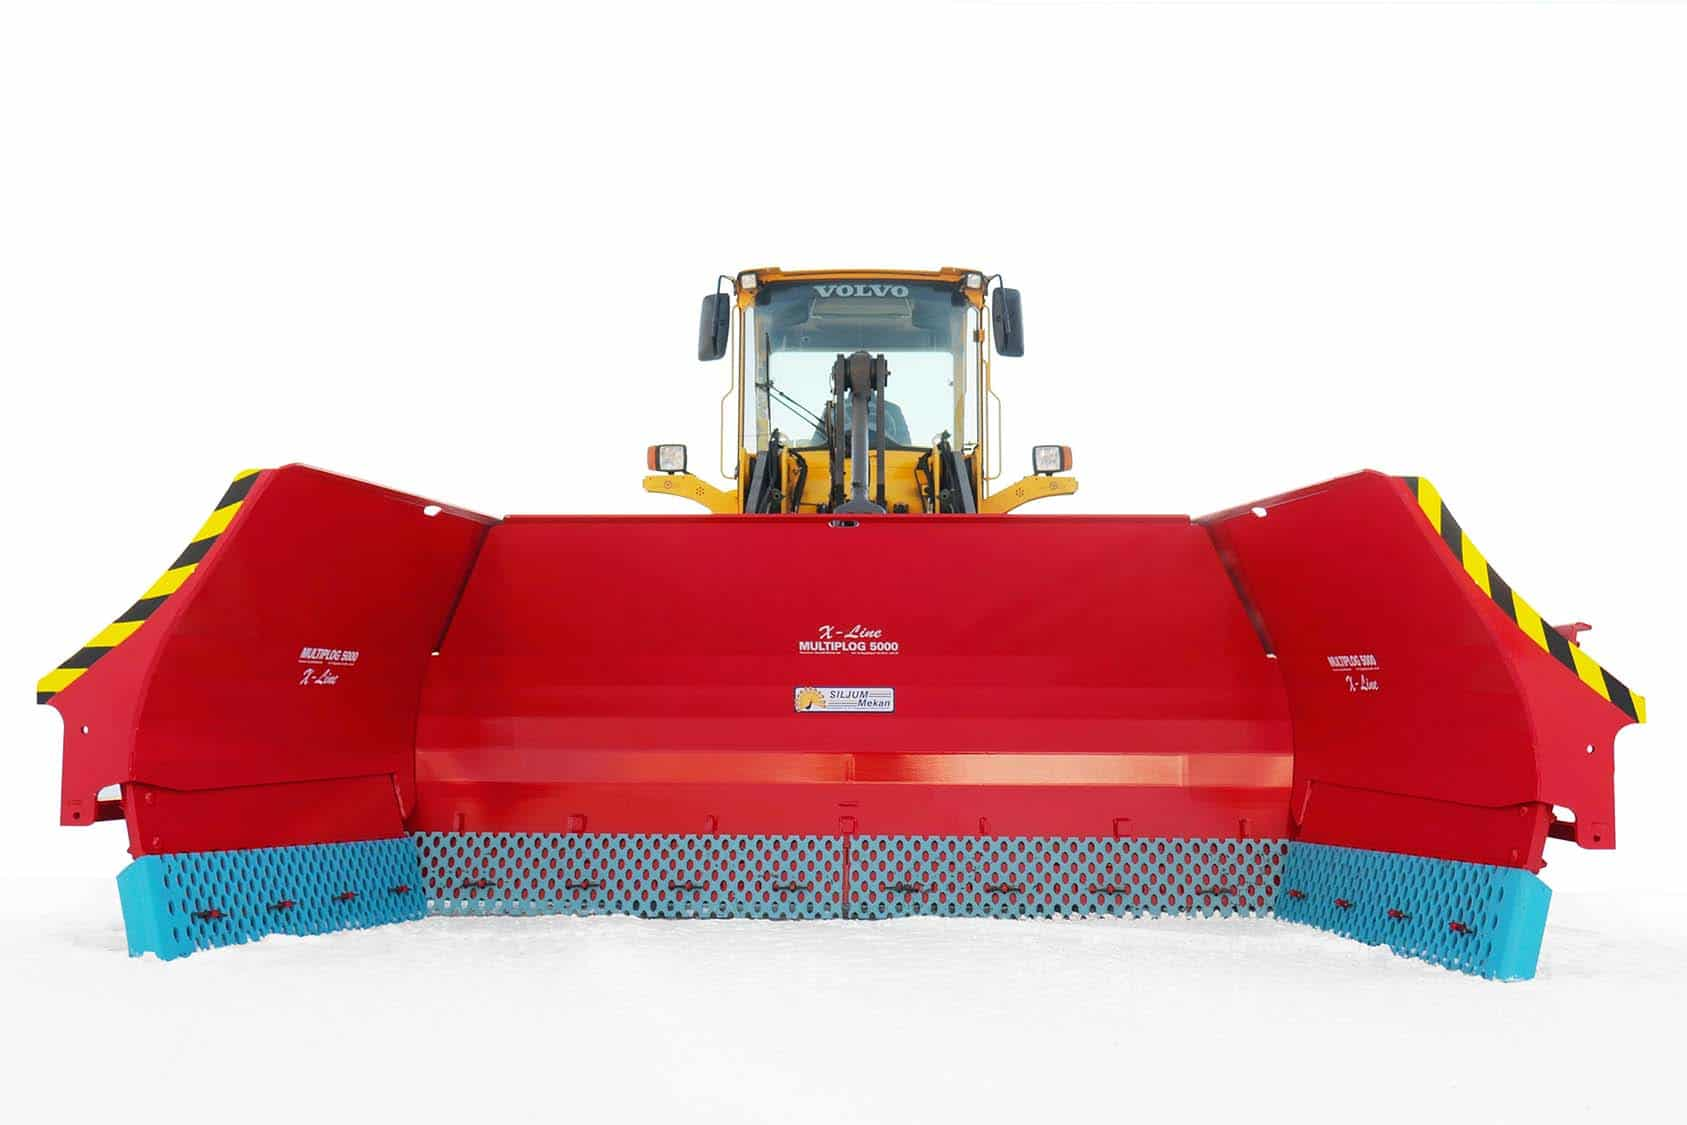 Siljum Multiplog 5000 X-Line